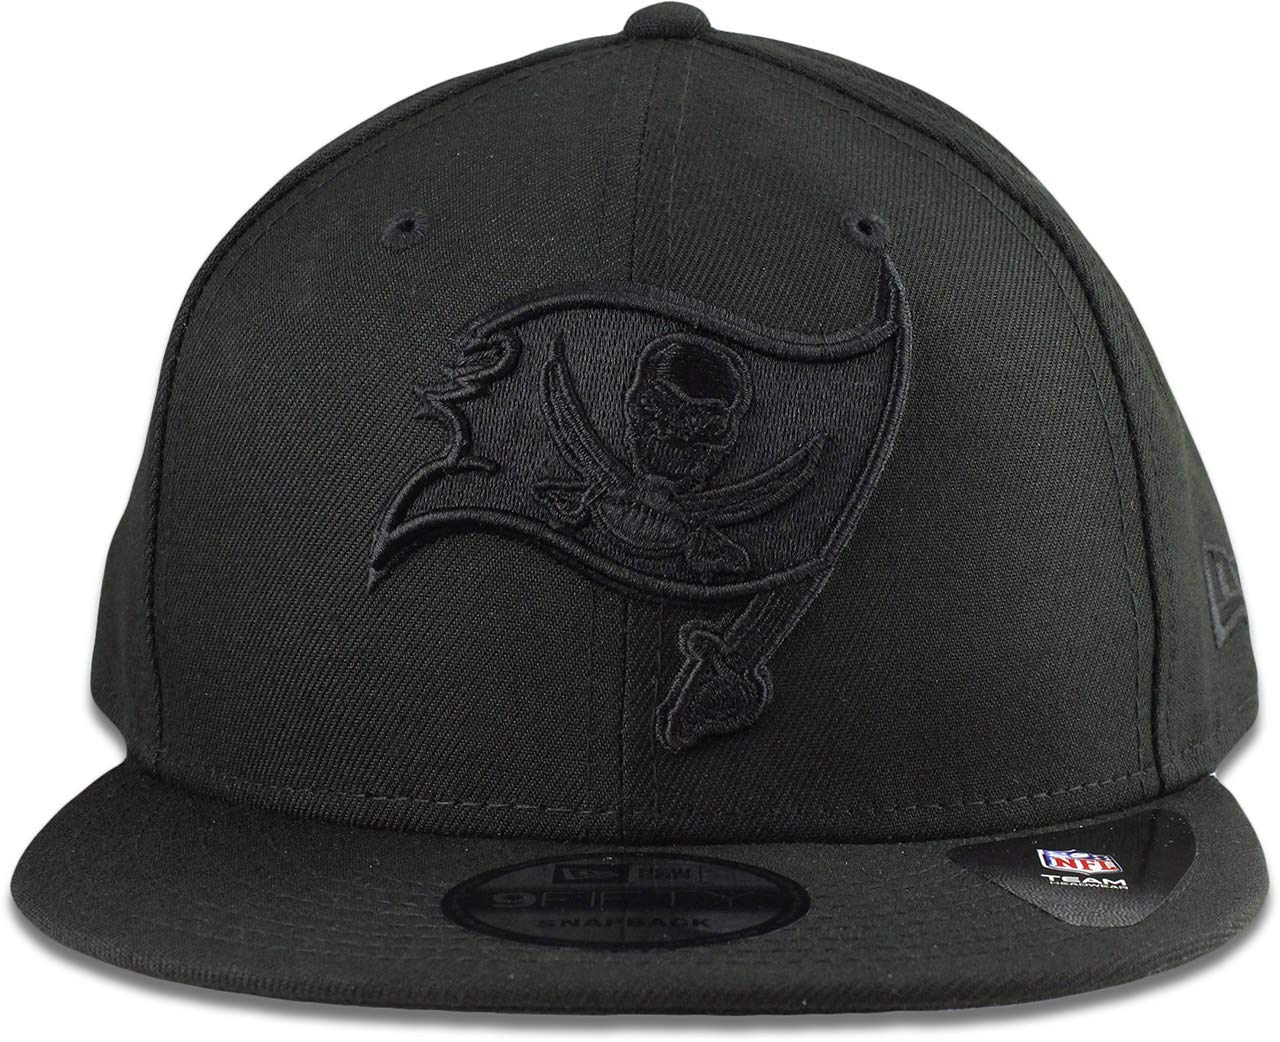 Amazon.com   New Era Tampa Bay Buccaneers Hat NFL Black on Black 9FIFTY  Snapback Adjustable Cap Adult One Size   Sports   Outdoors b81e016ddbb